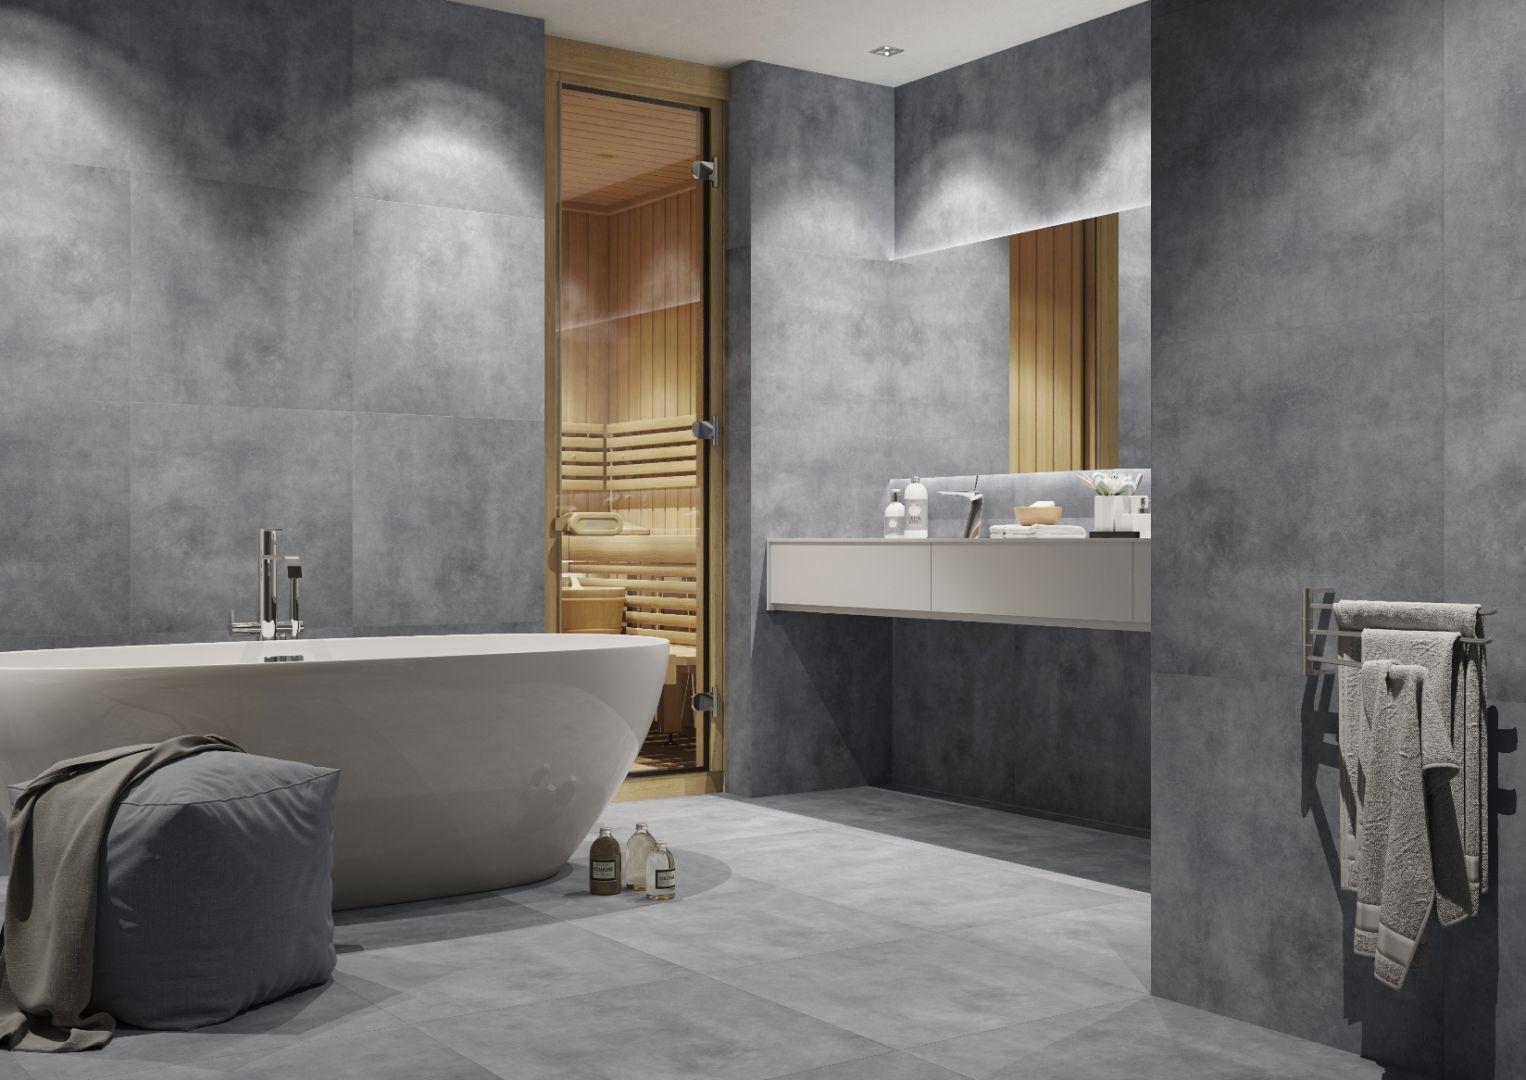 Nowoczesna łazienka total look - wybieramy kolor. Kolekcja batista steel. Fot. Cerrad